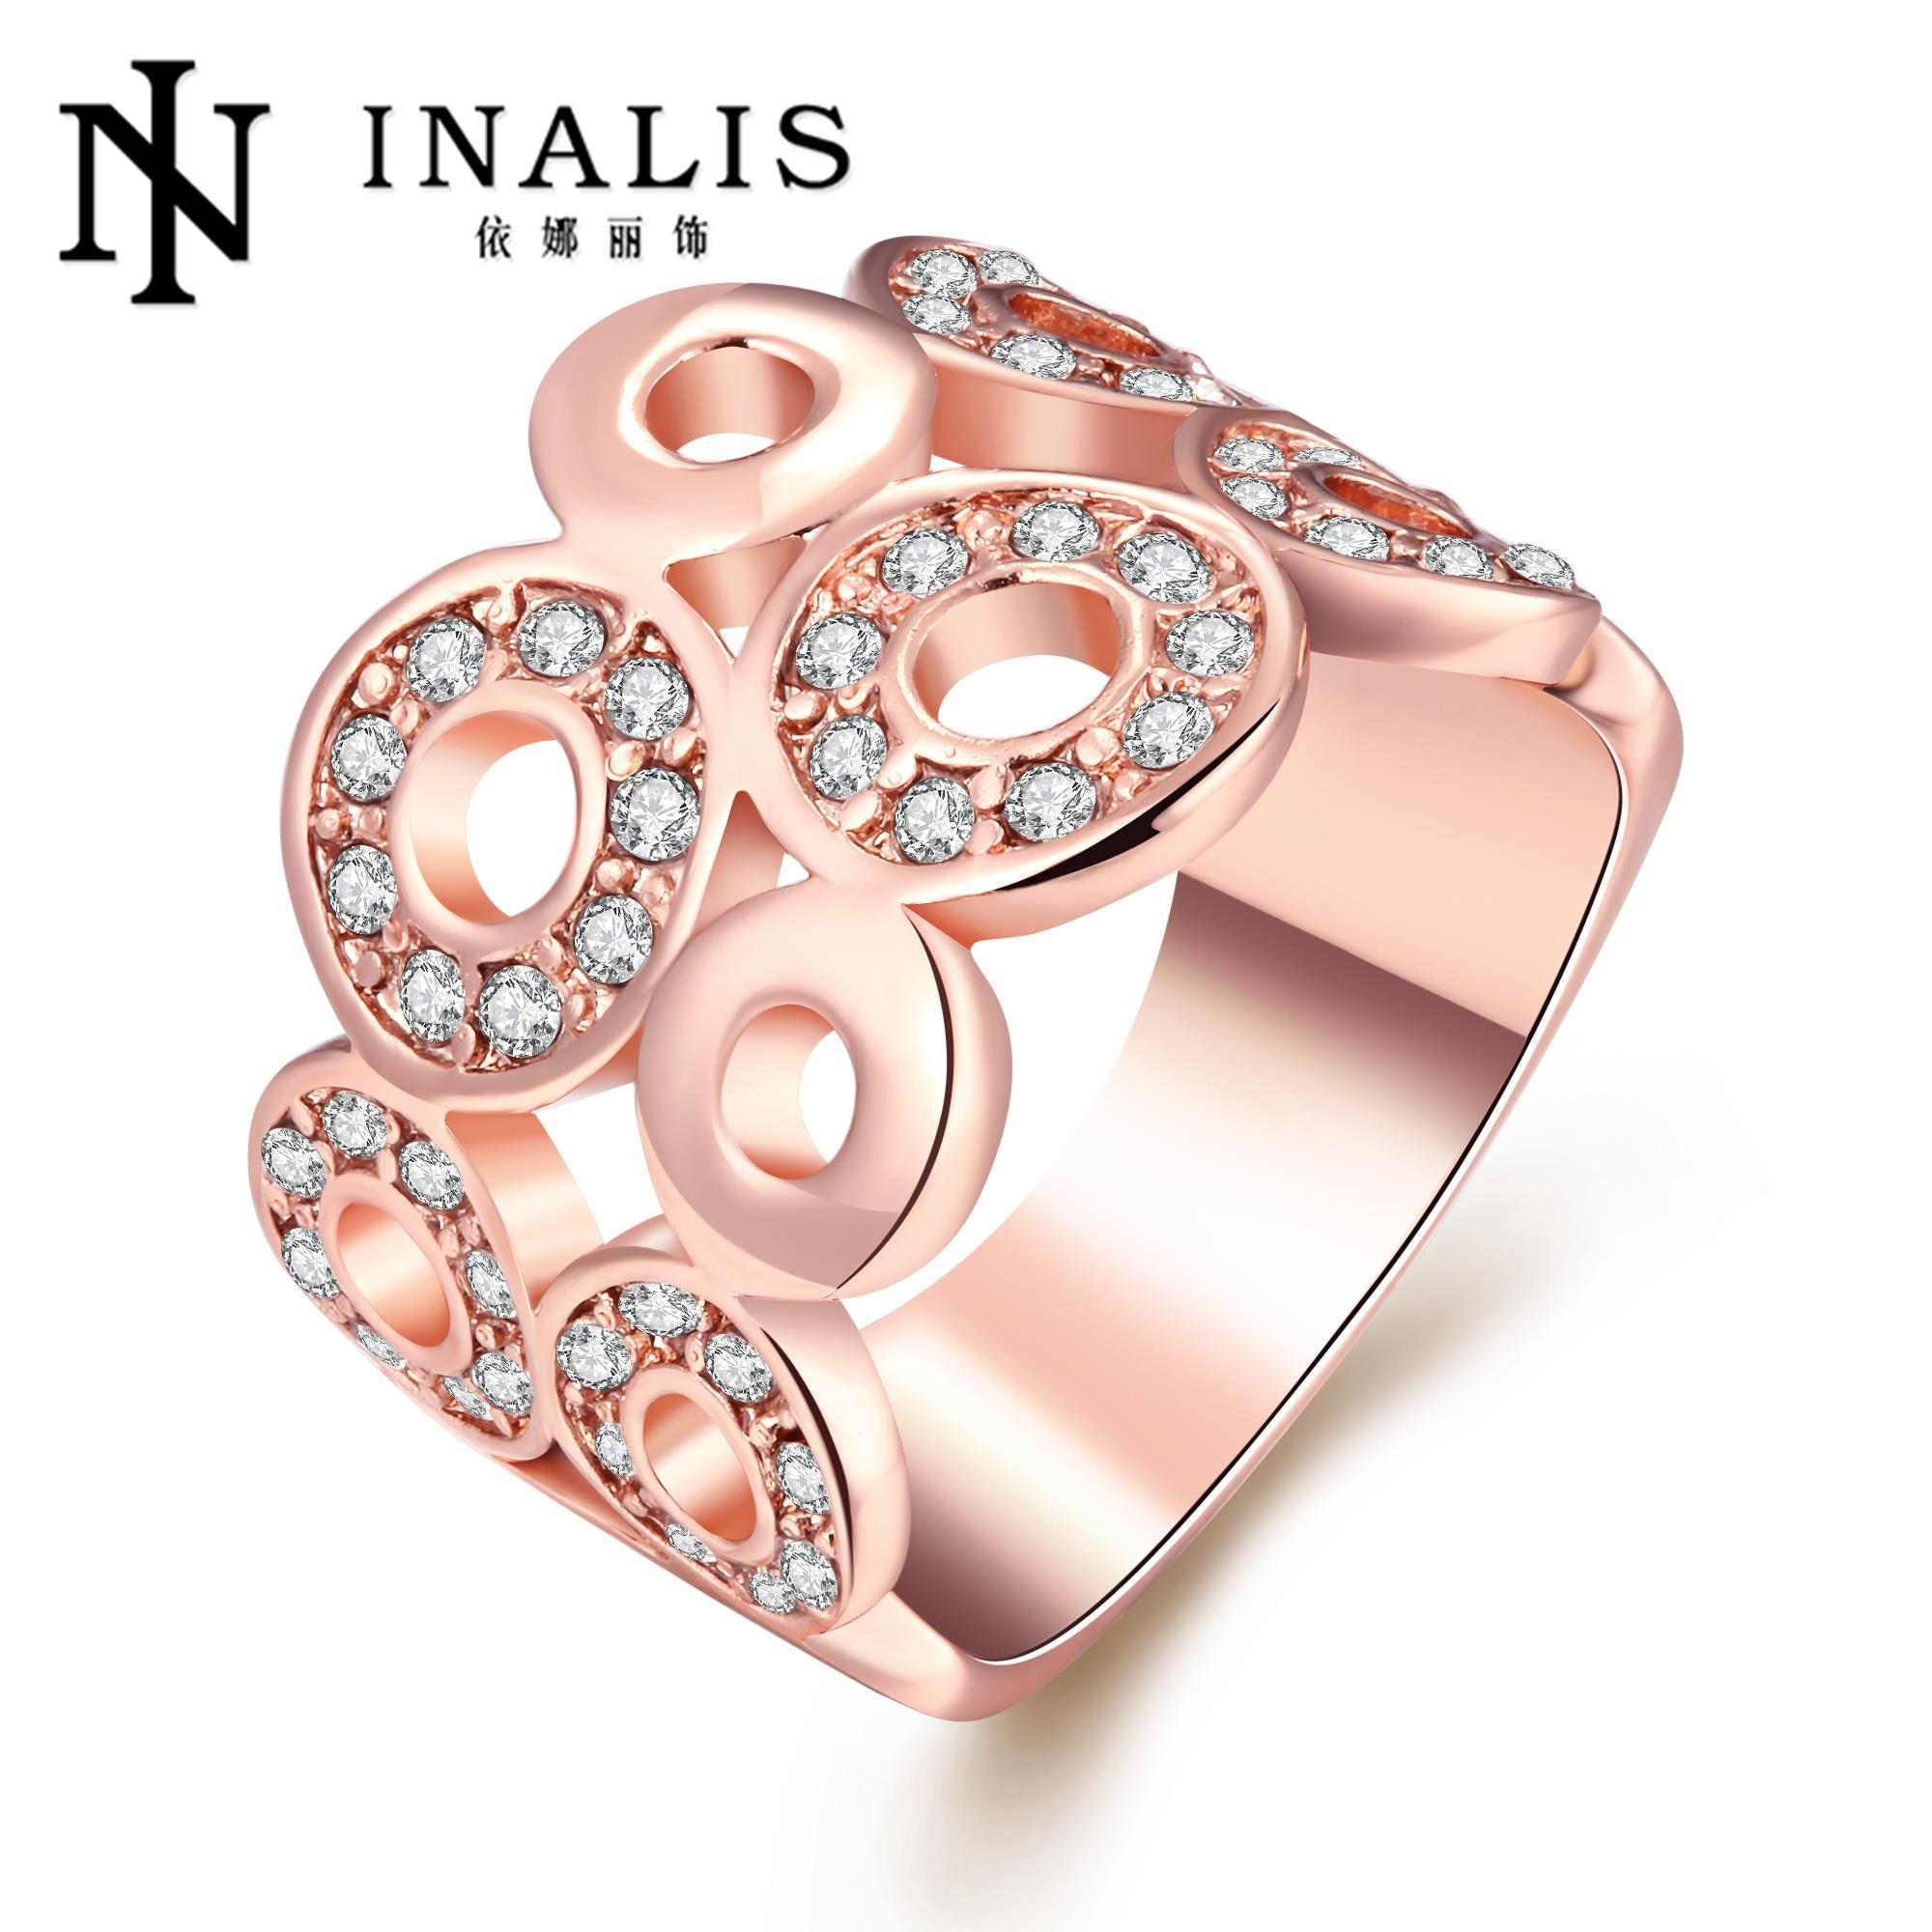 Unique Rose Gold Wedding Ring Sets for Her | Wedding